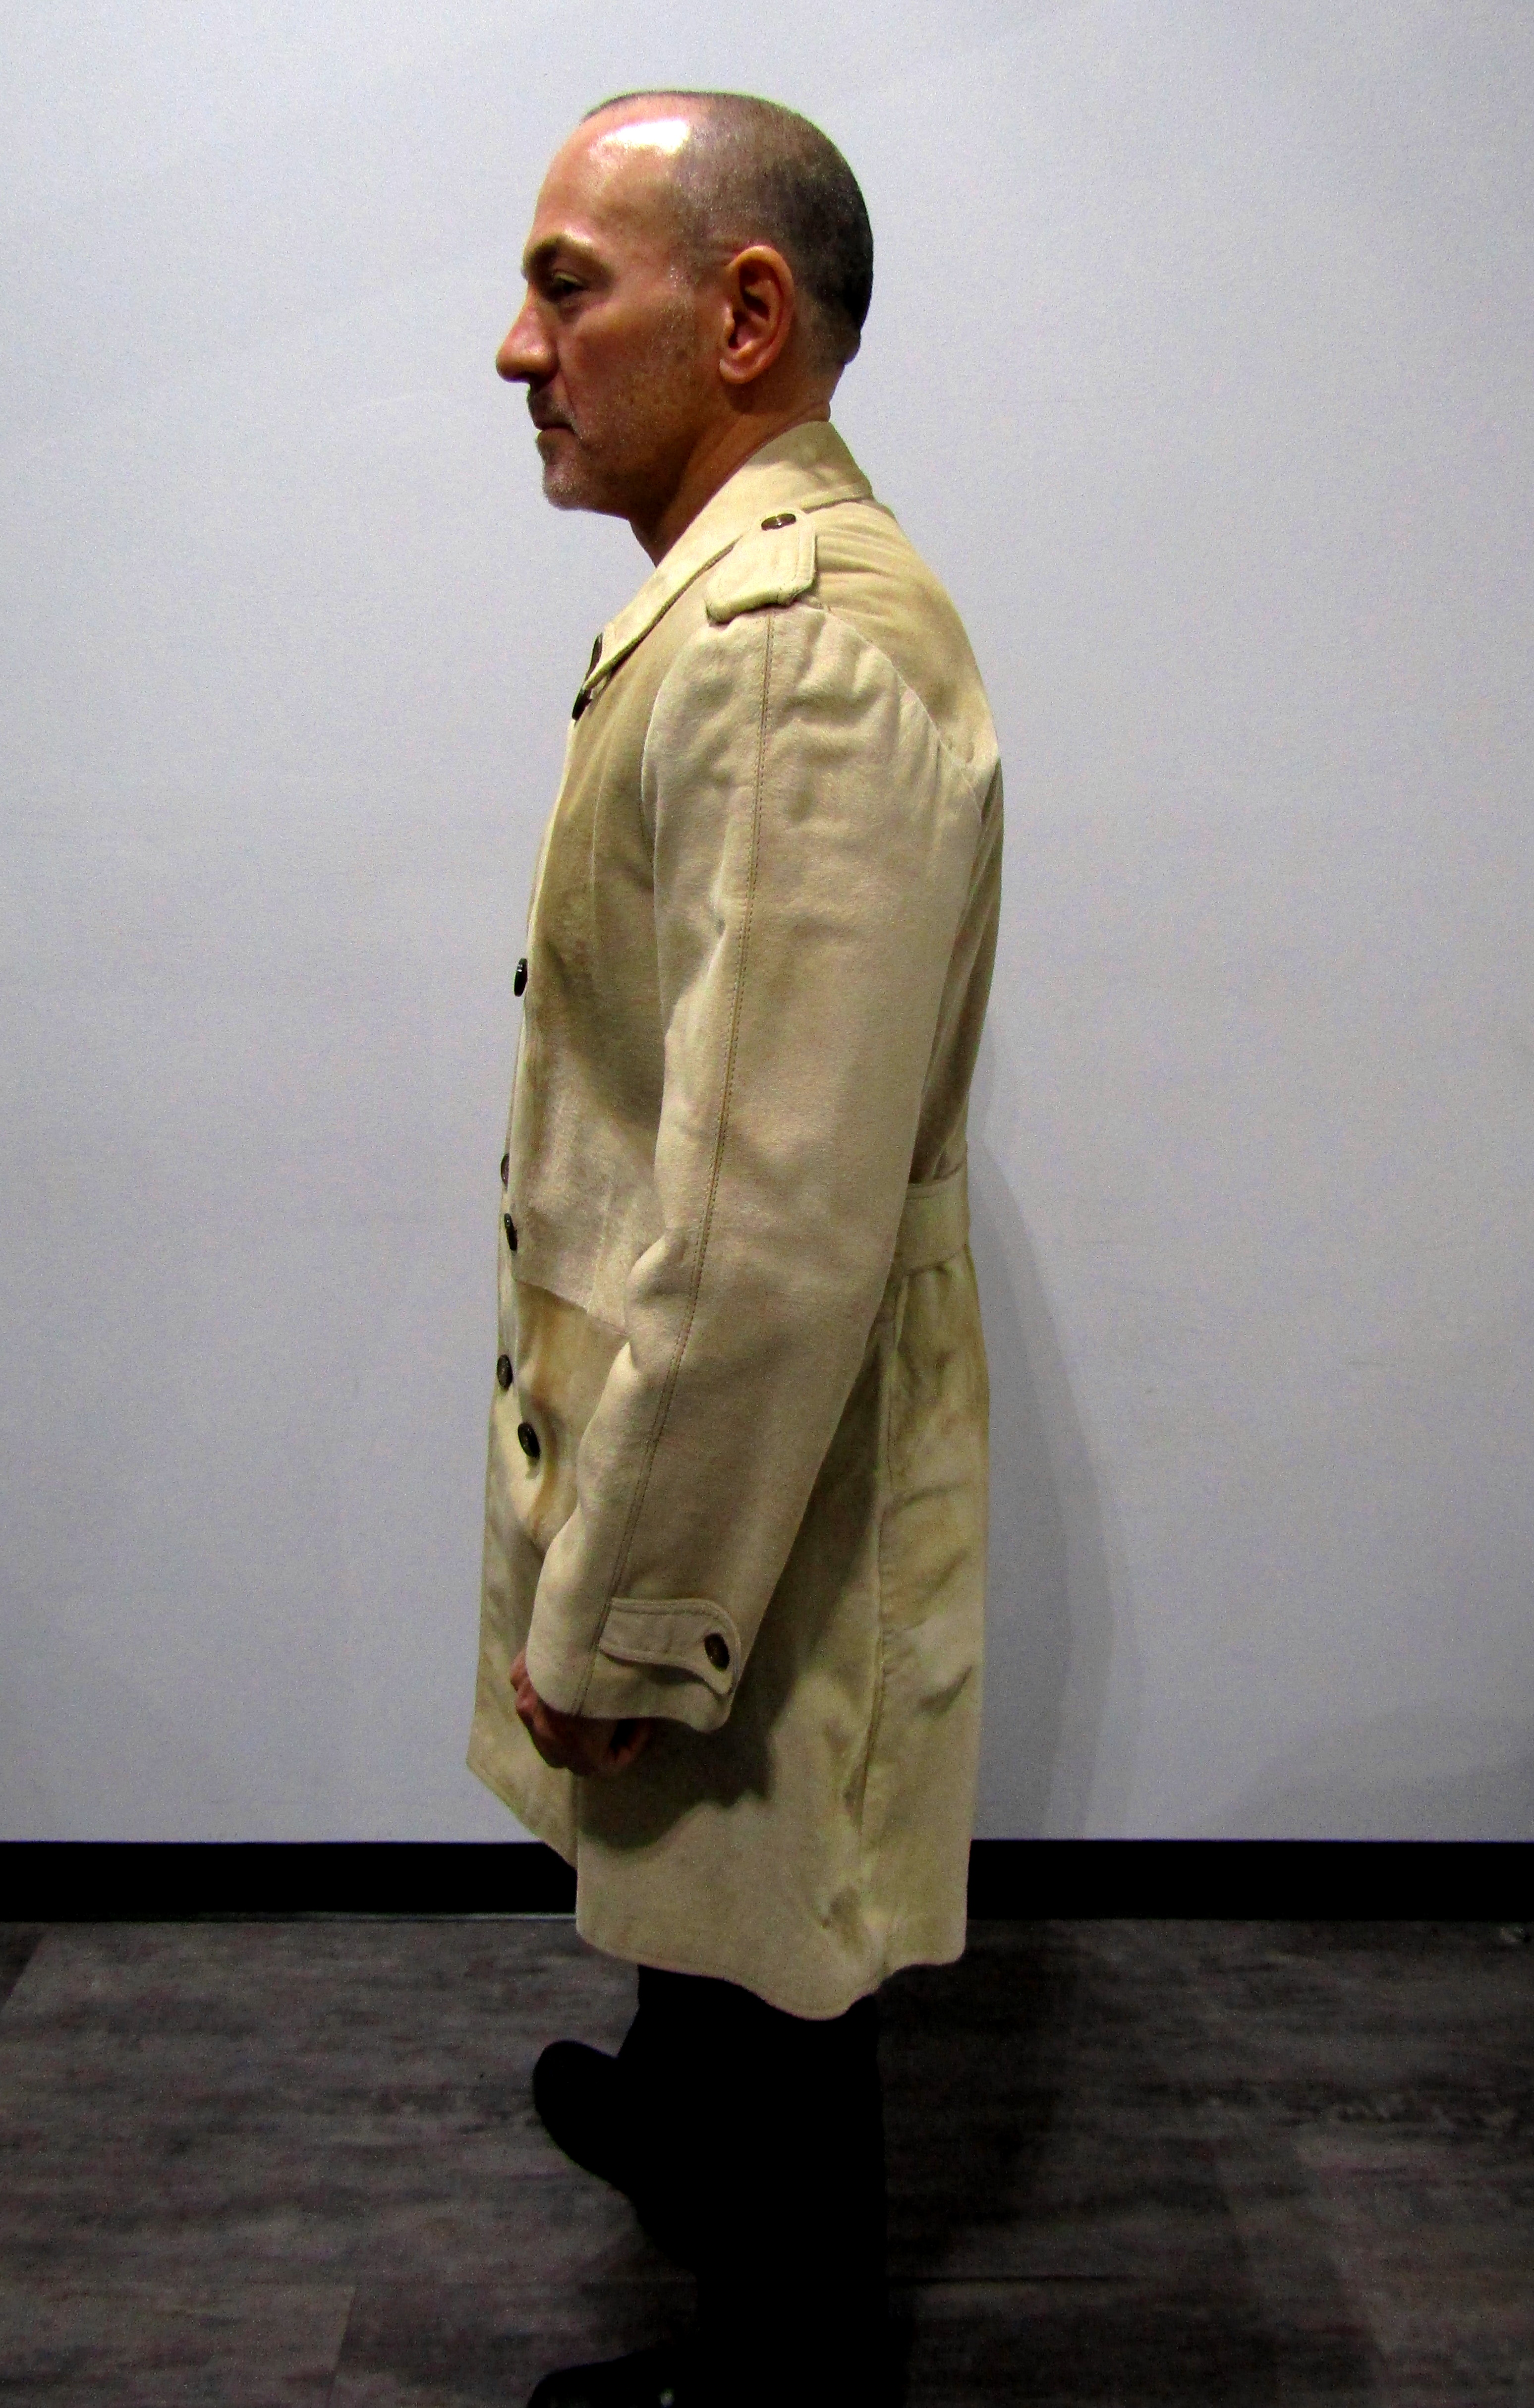 Brioni Men's Pre-Owned Dyed Beige Calf Skin Walker (size 40)